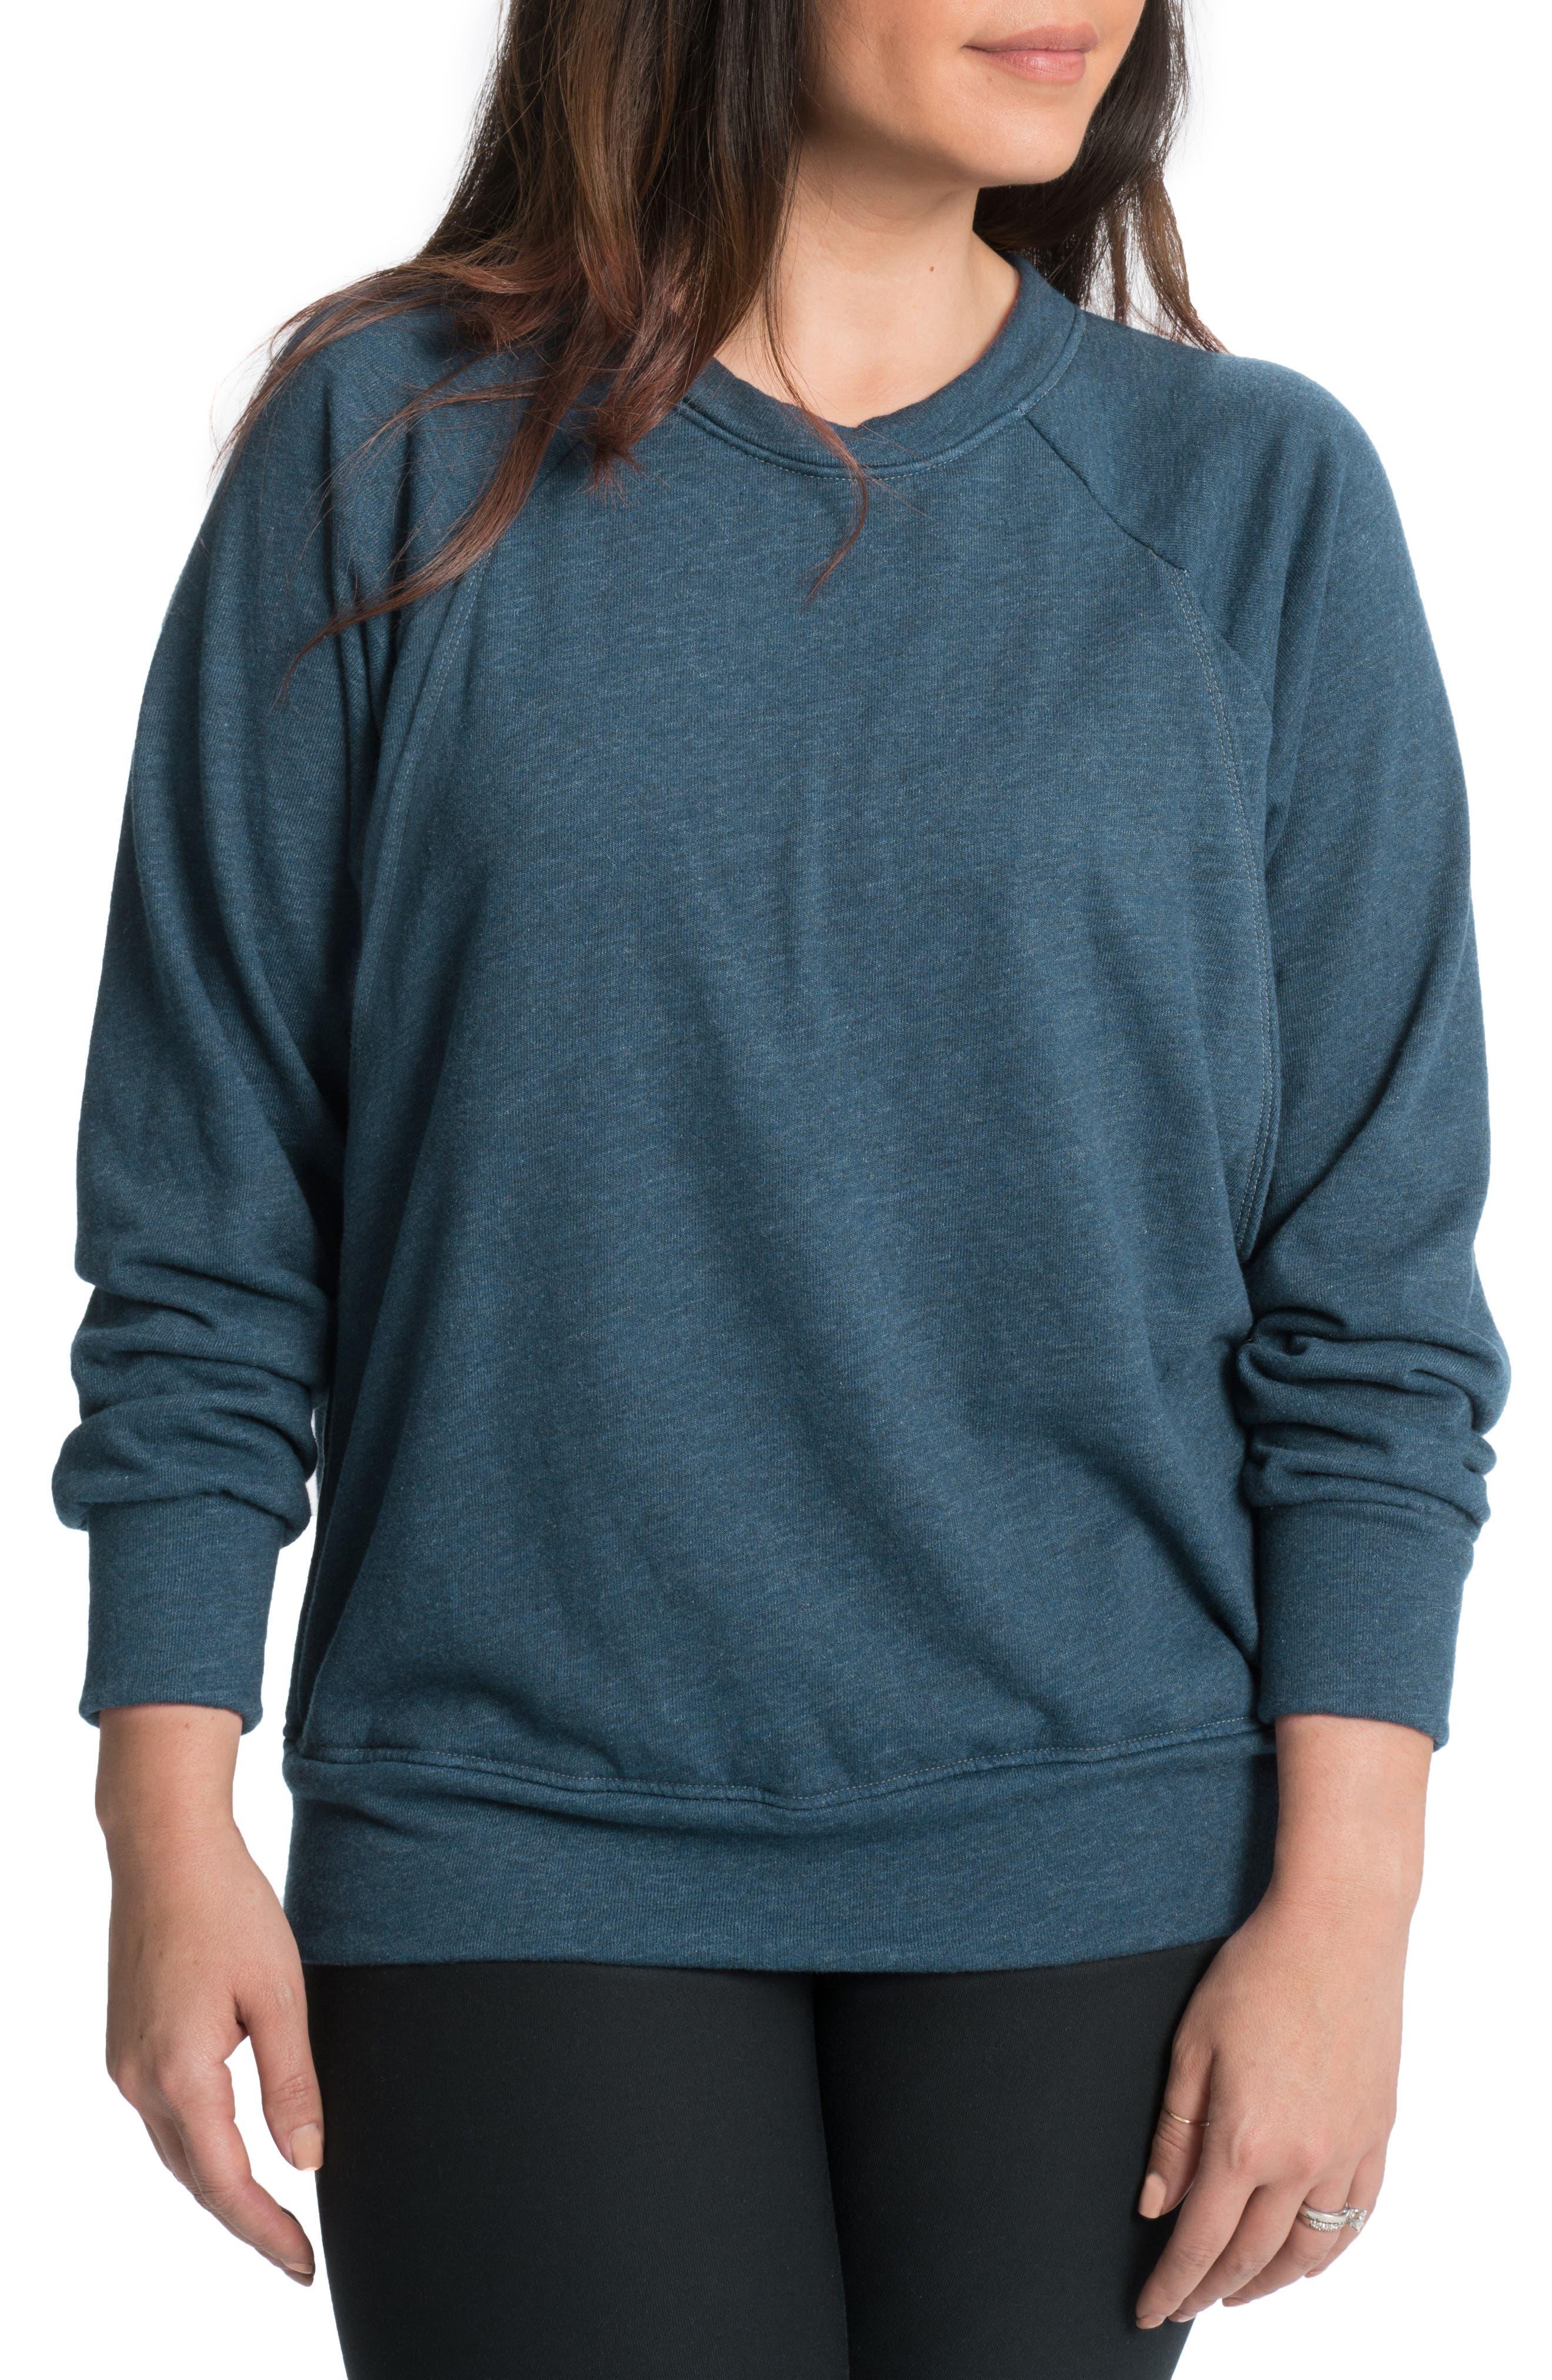 BUN MATERNITY, Relaxed Daily Maternity/Nursing Sweatshirt, Main thumbnail 1, color, 001